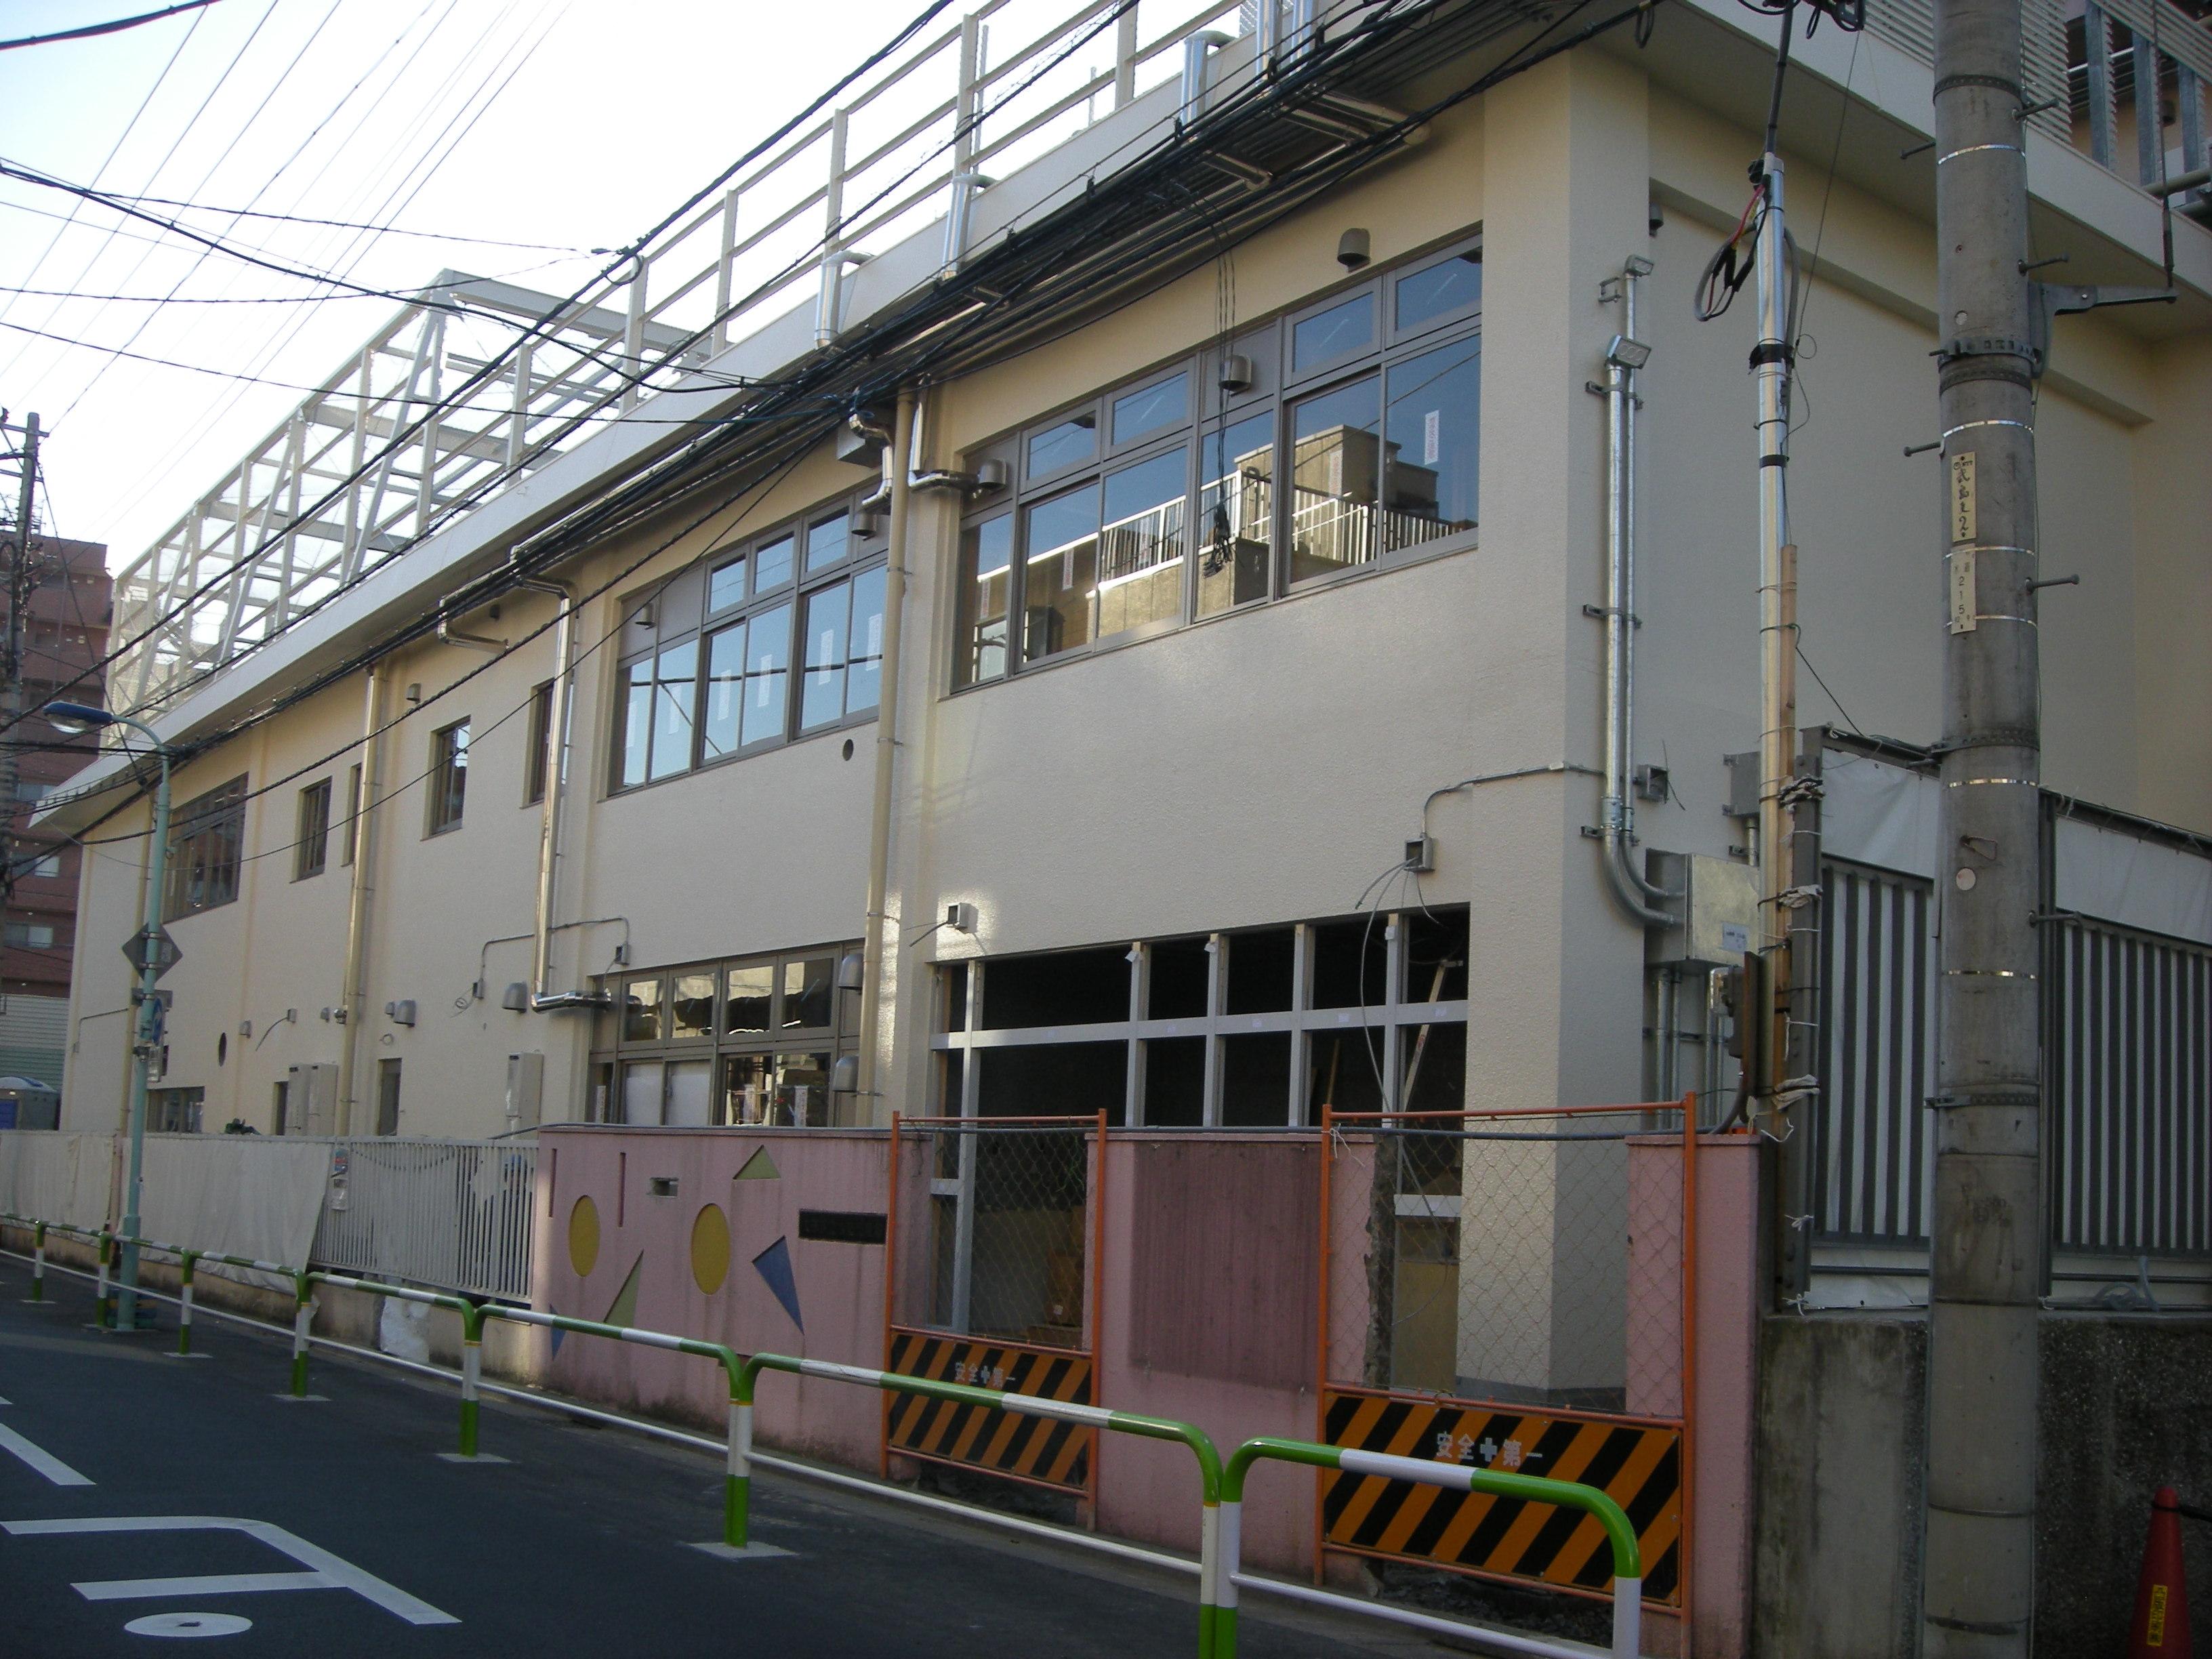 aaeeyeaccaoaeccn-002.JPG